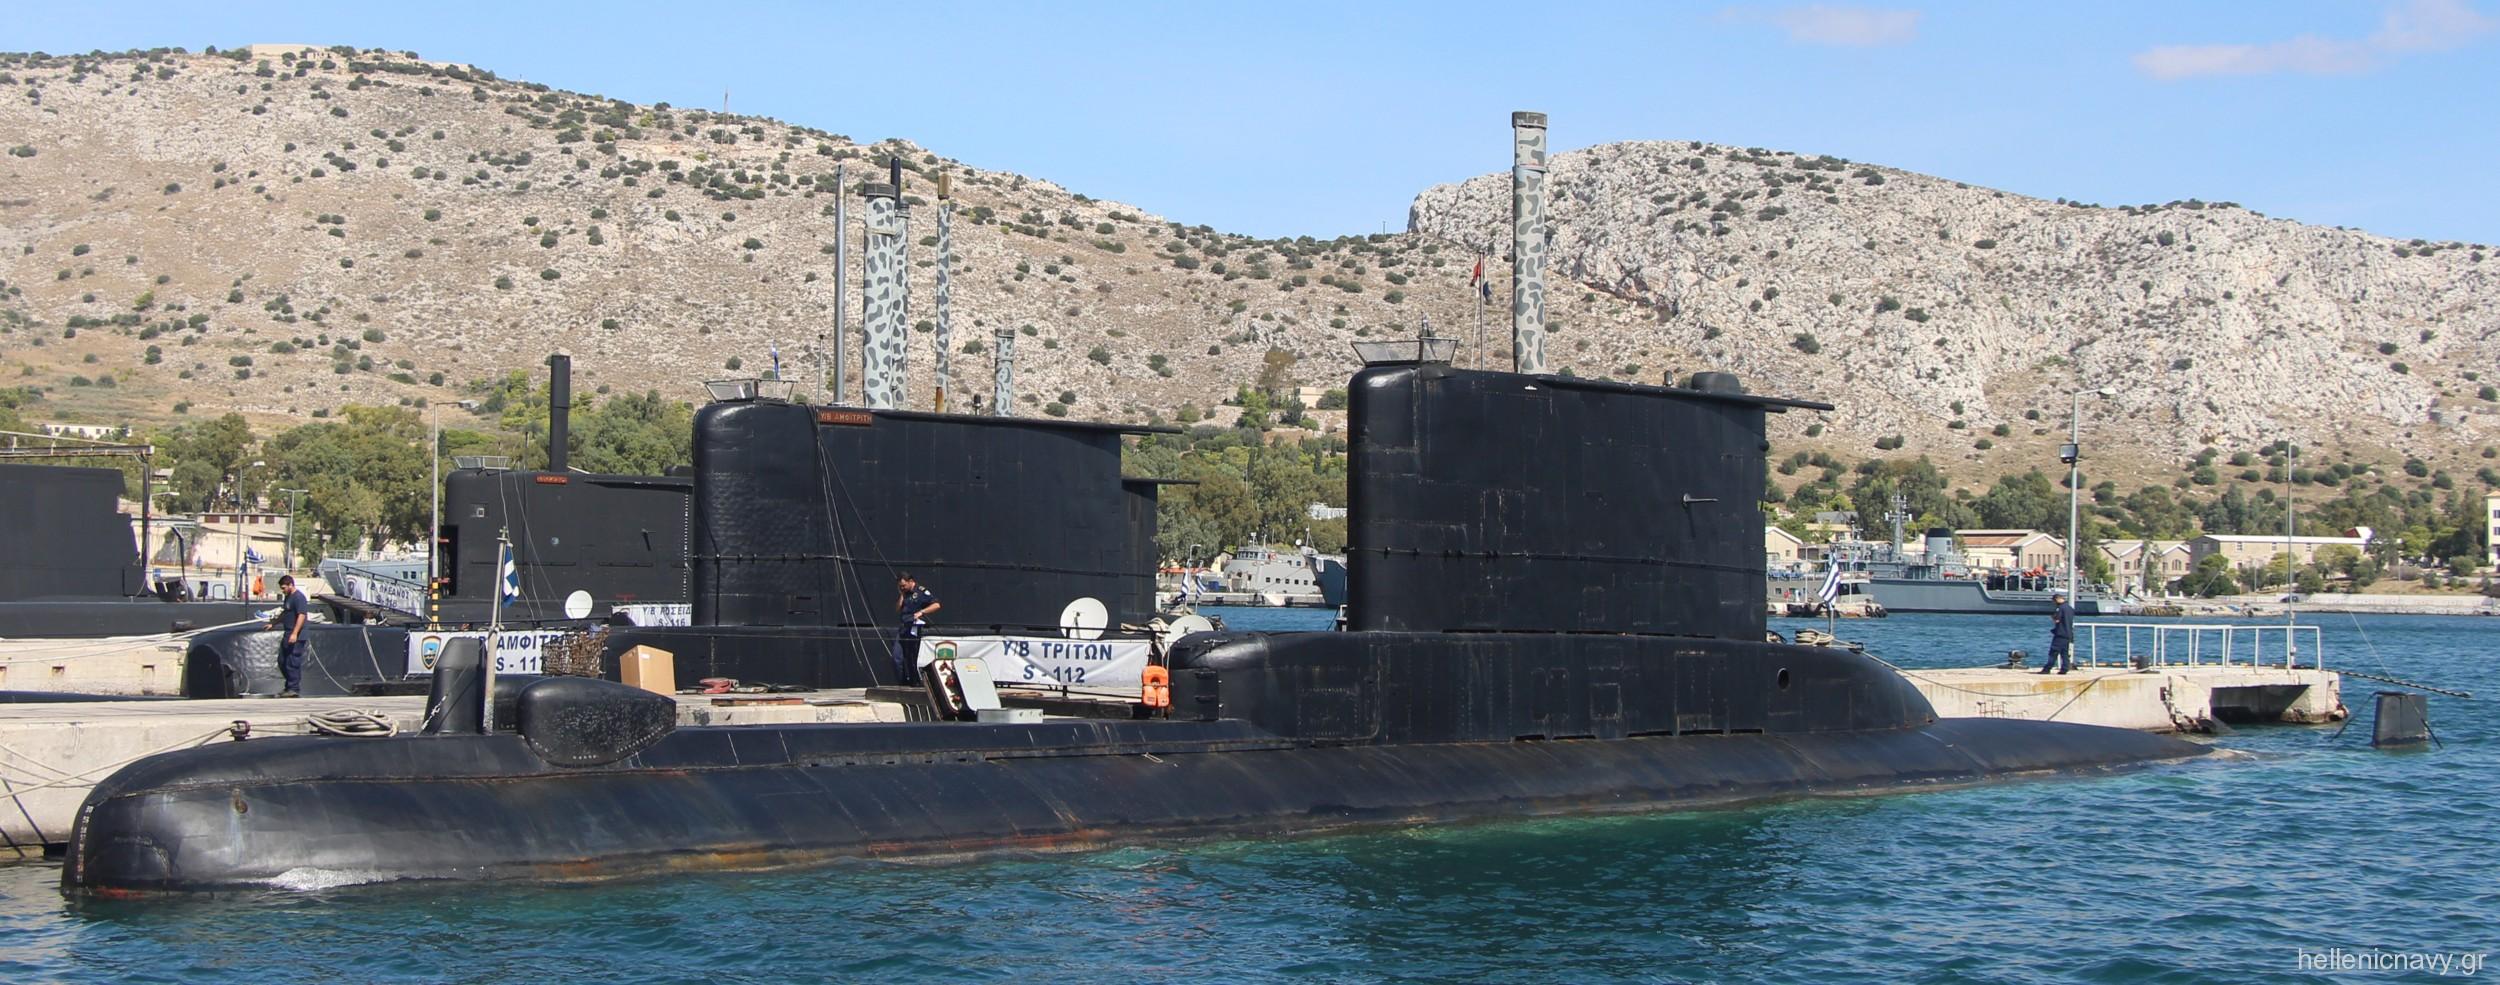 glaukos class type 209-100 submarine hellenic navy greece nereus triton proteus